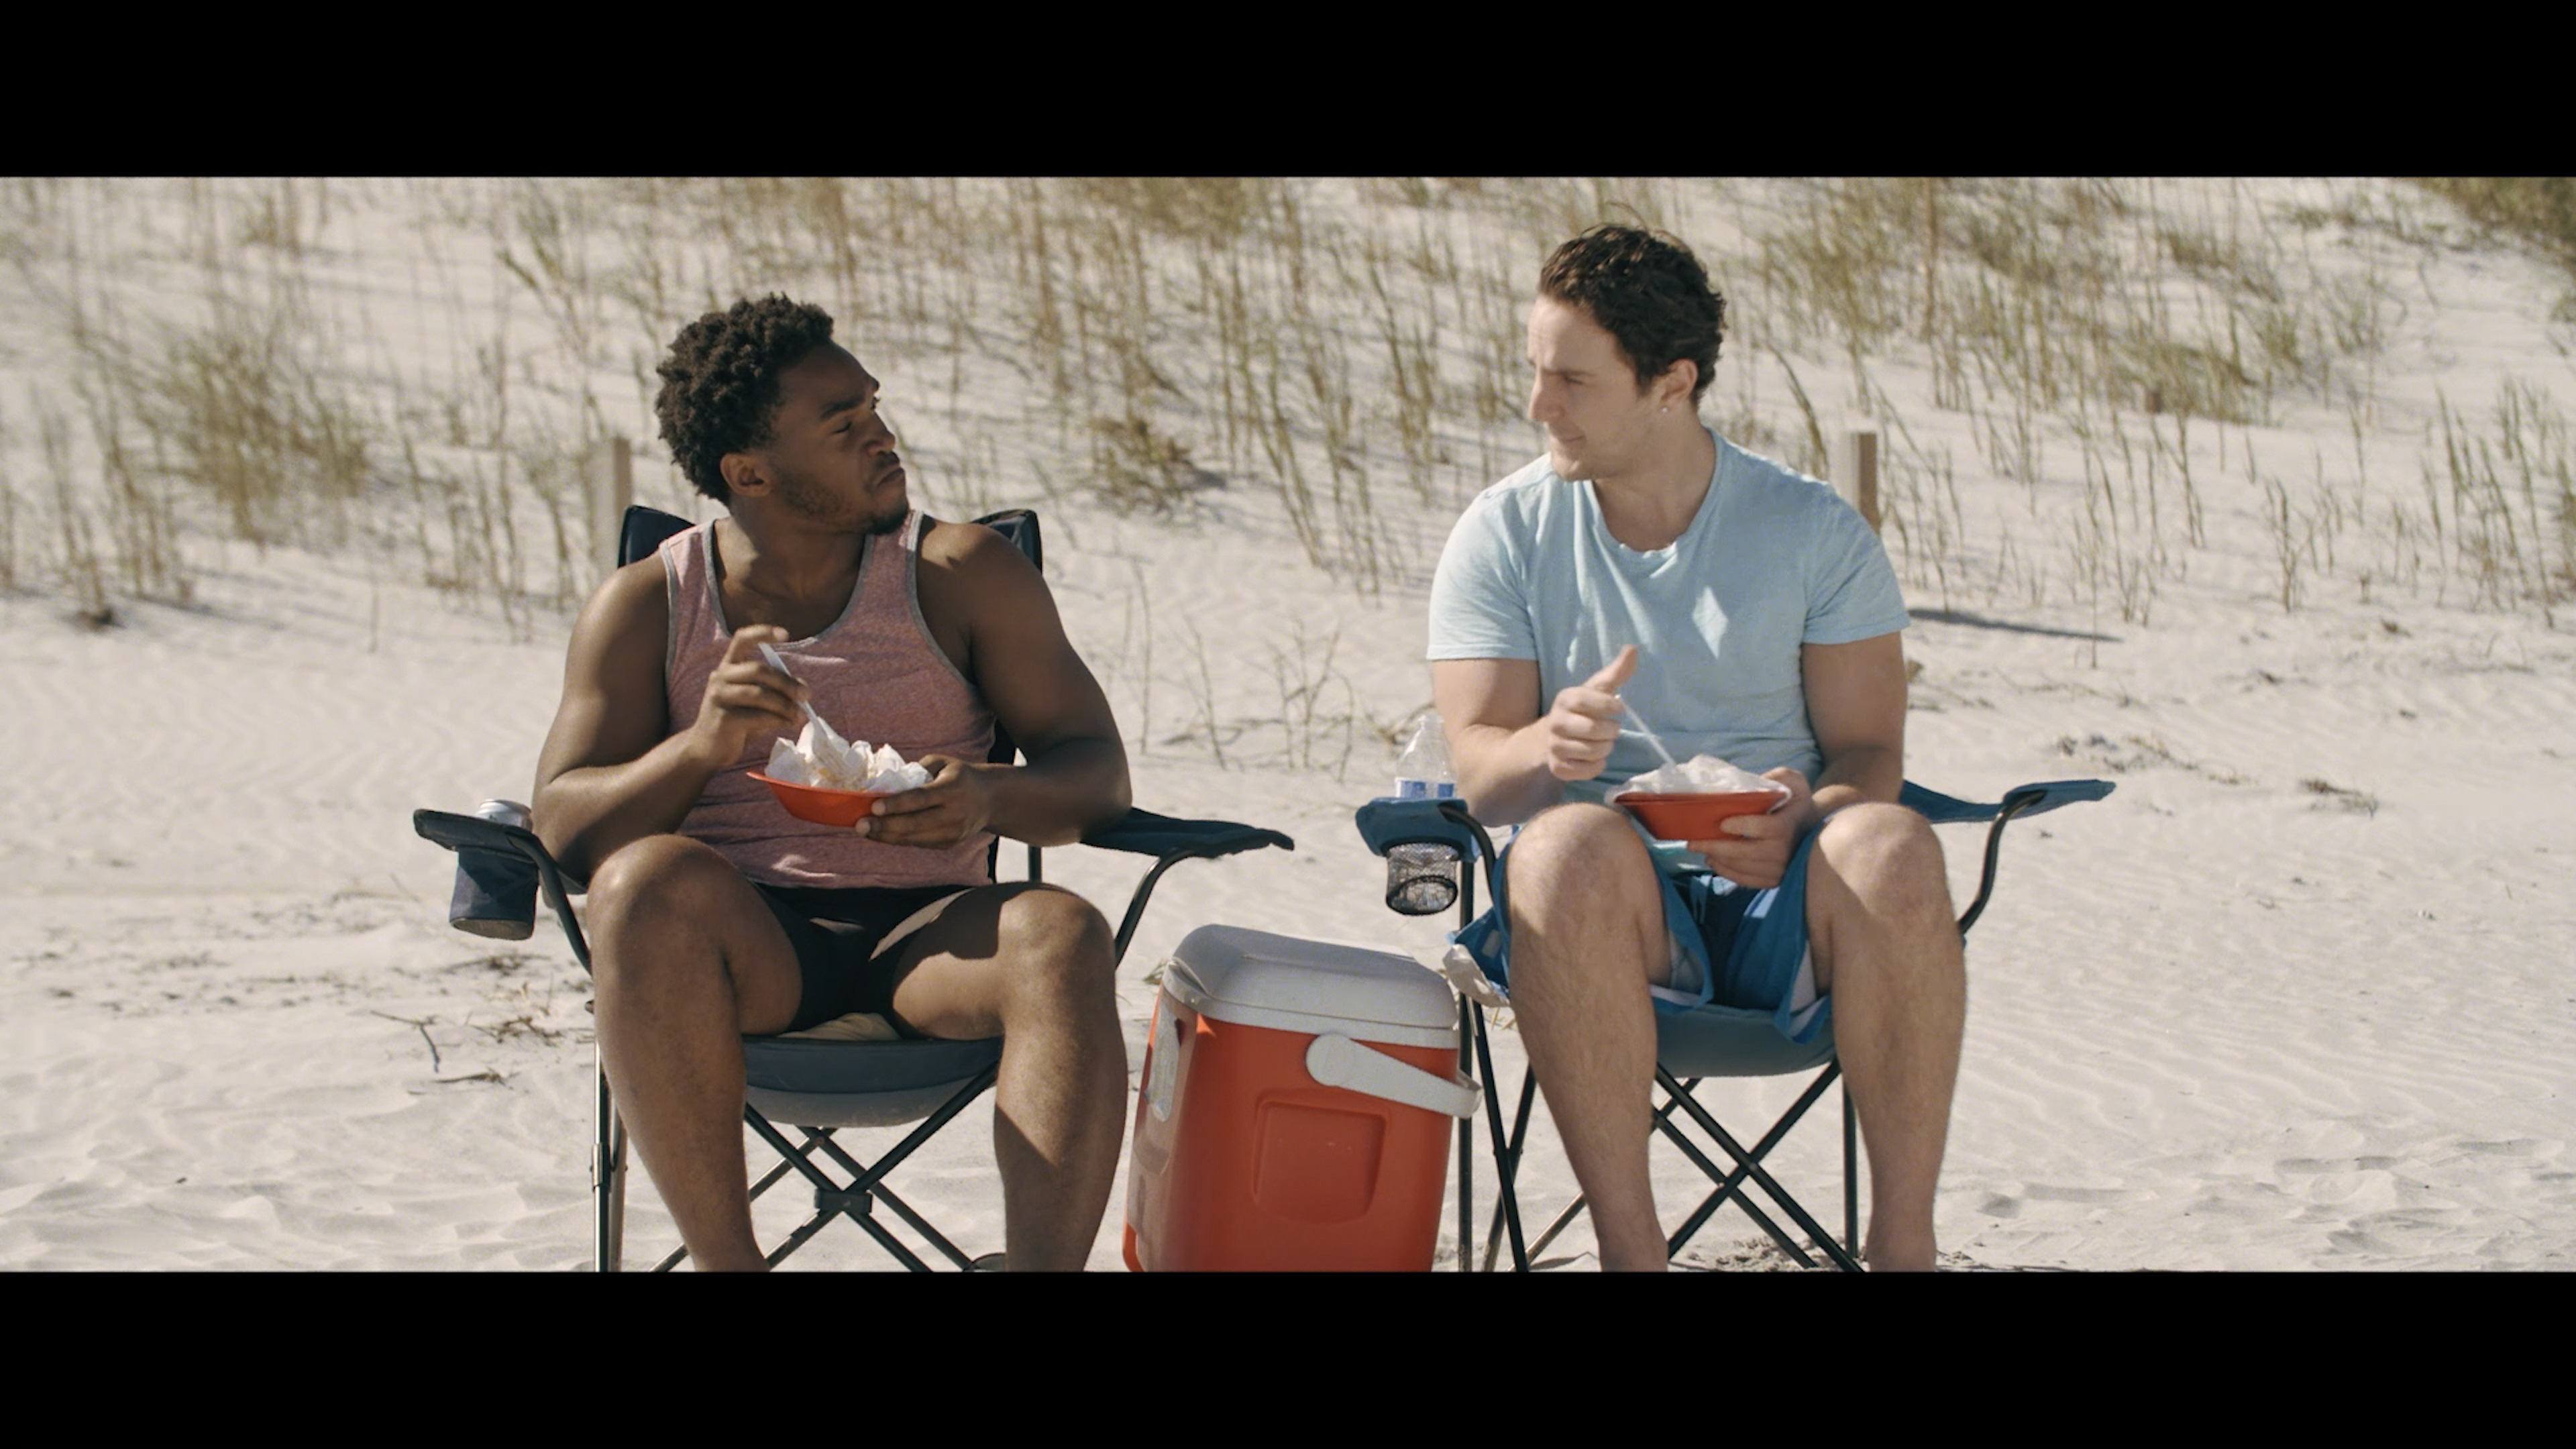 Beau Walker and Sheldon Mba in Found (2016)